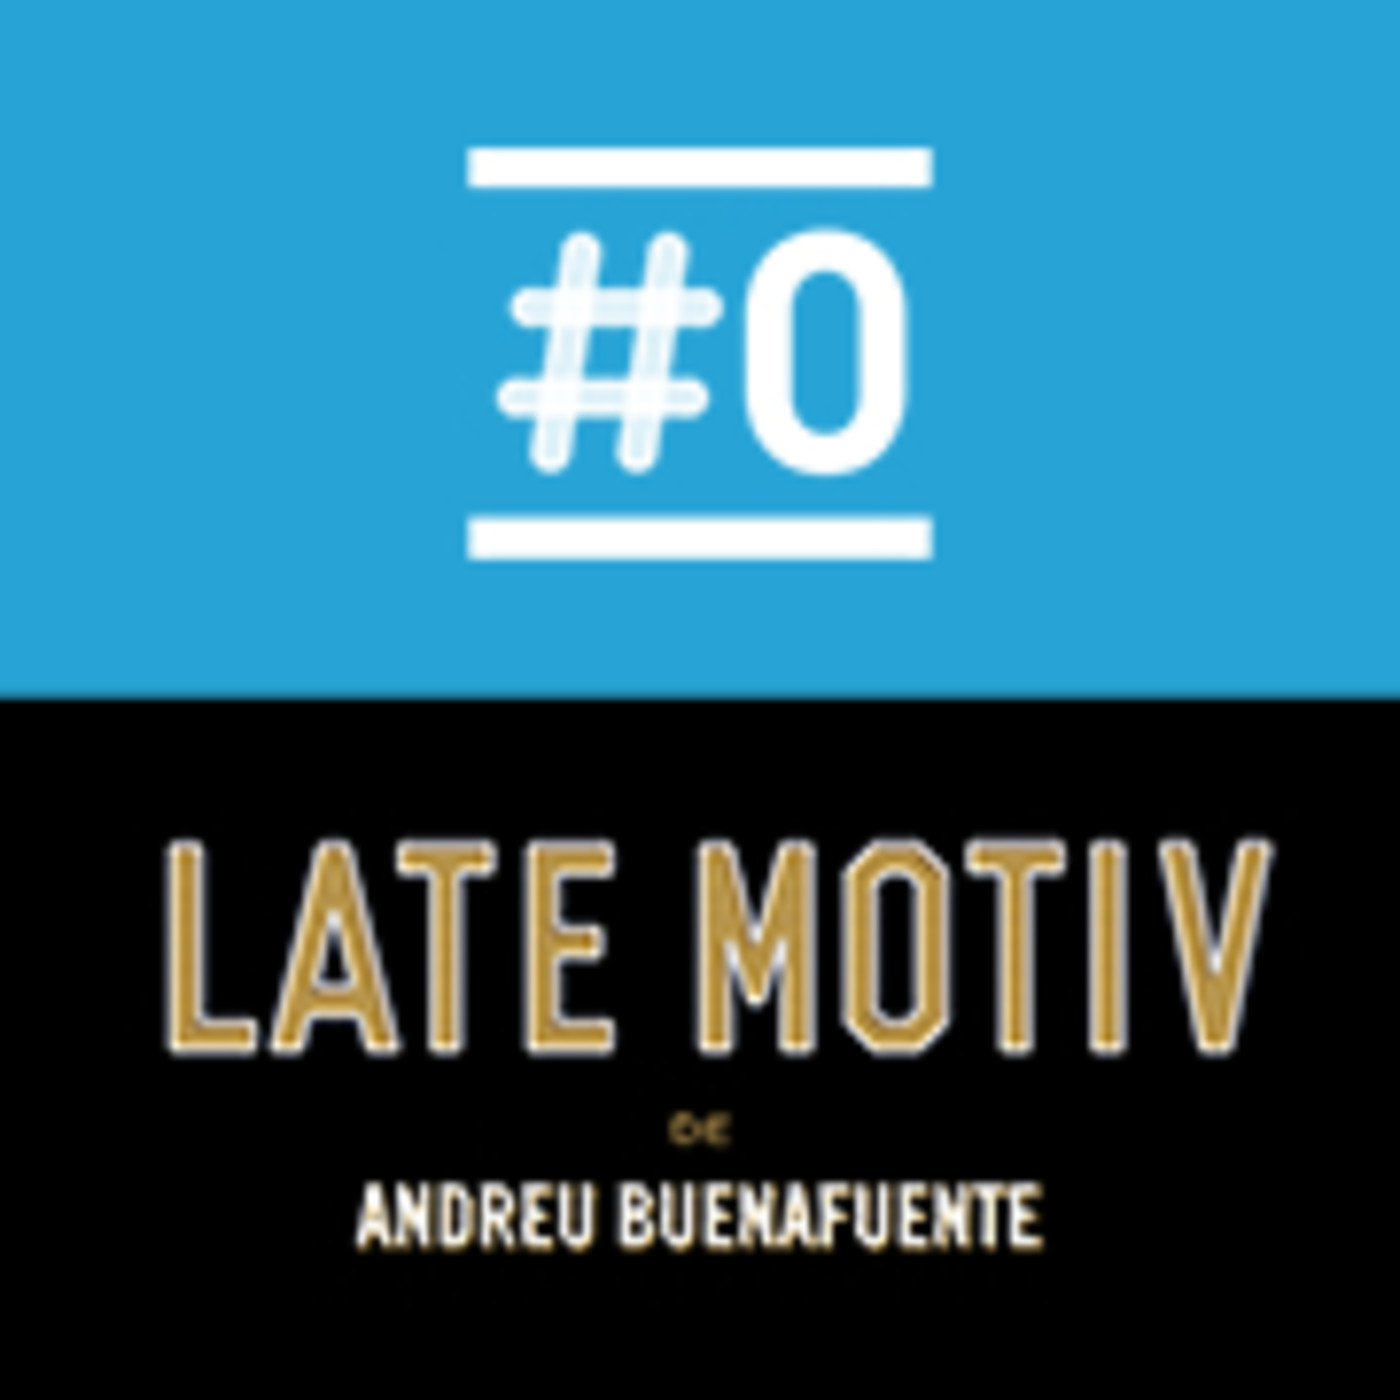 LATE MOTIV 574 - Programa completo